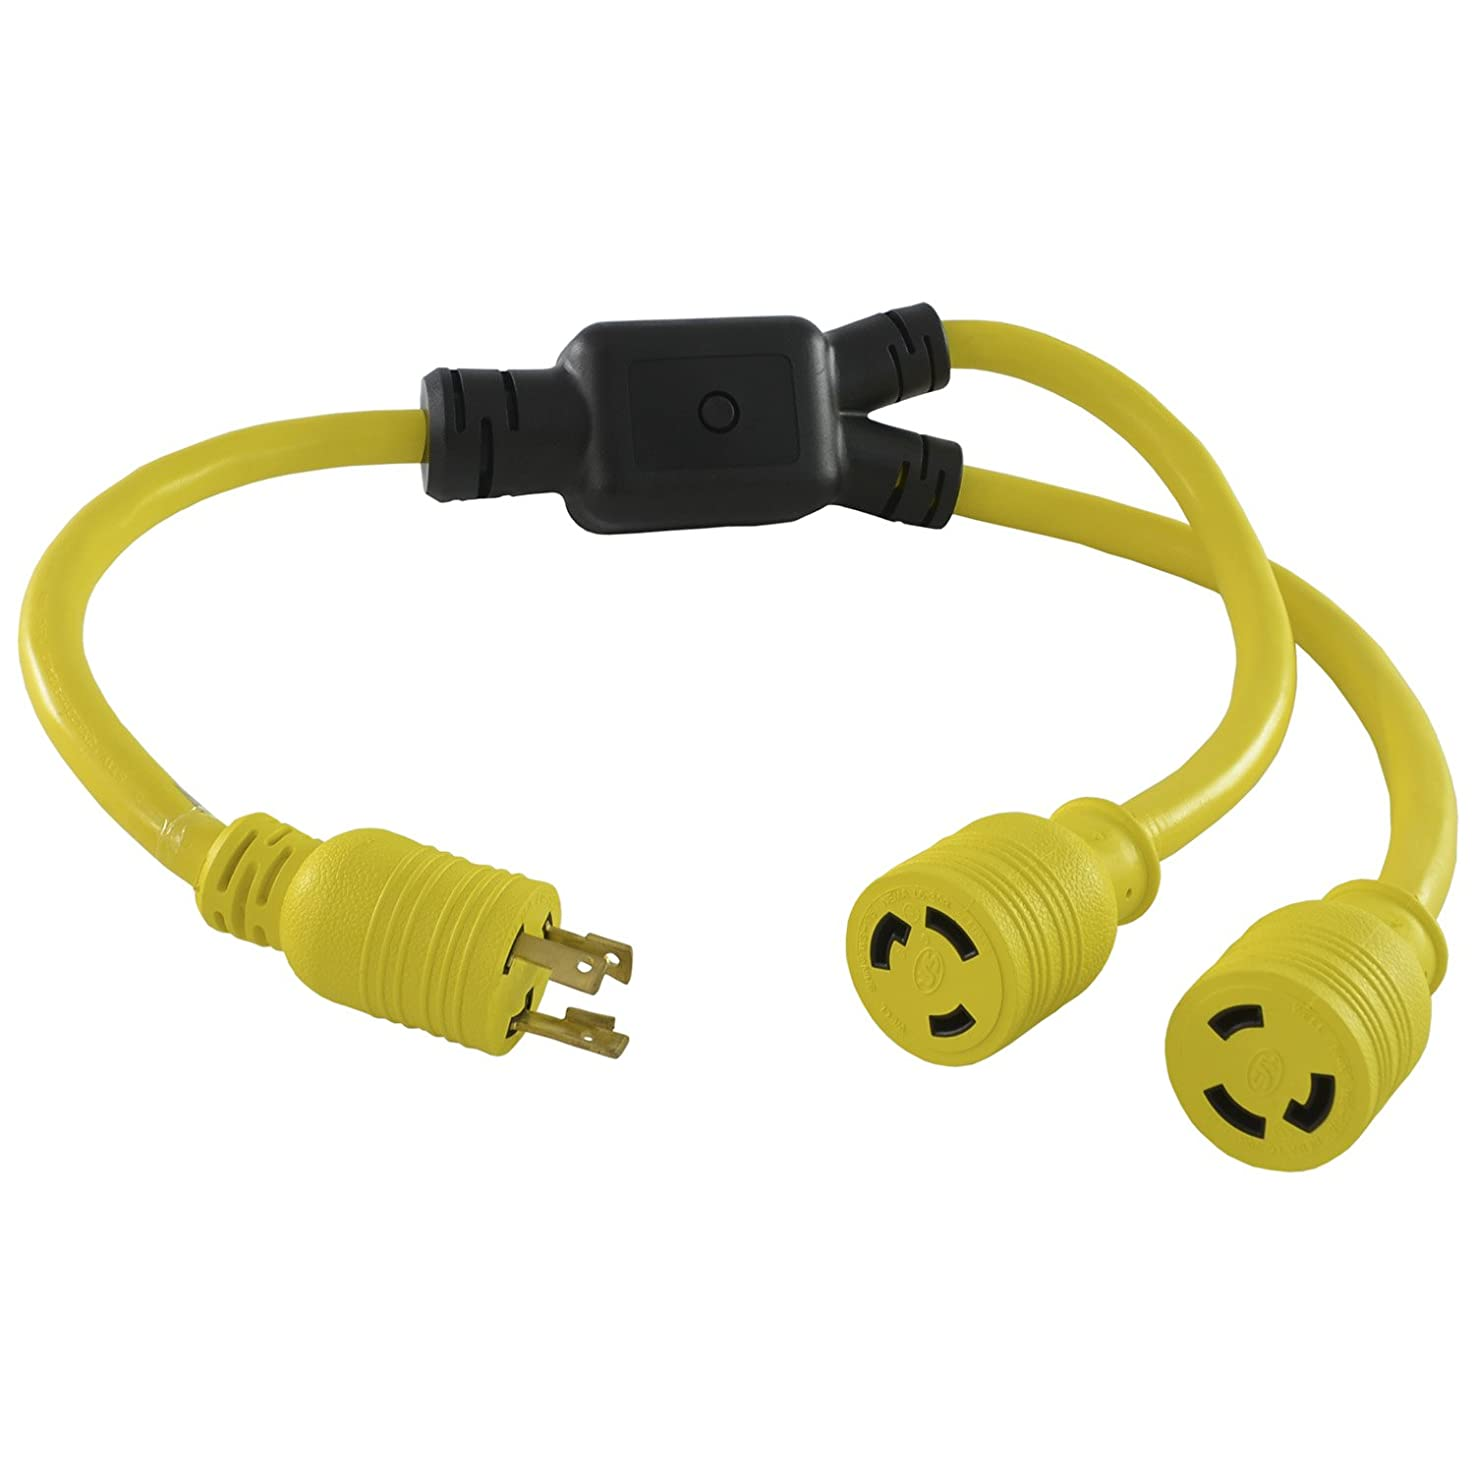 Conntek YL630L630 30 Amp 250V 3' Y-Adapter Cord L6-30P to NEMA L6-30R